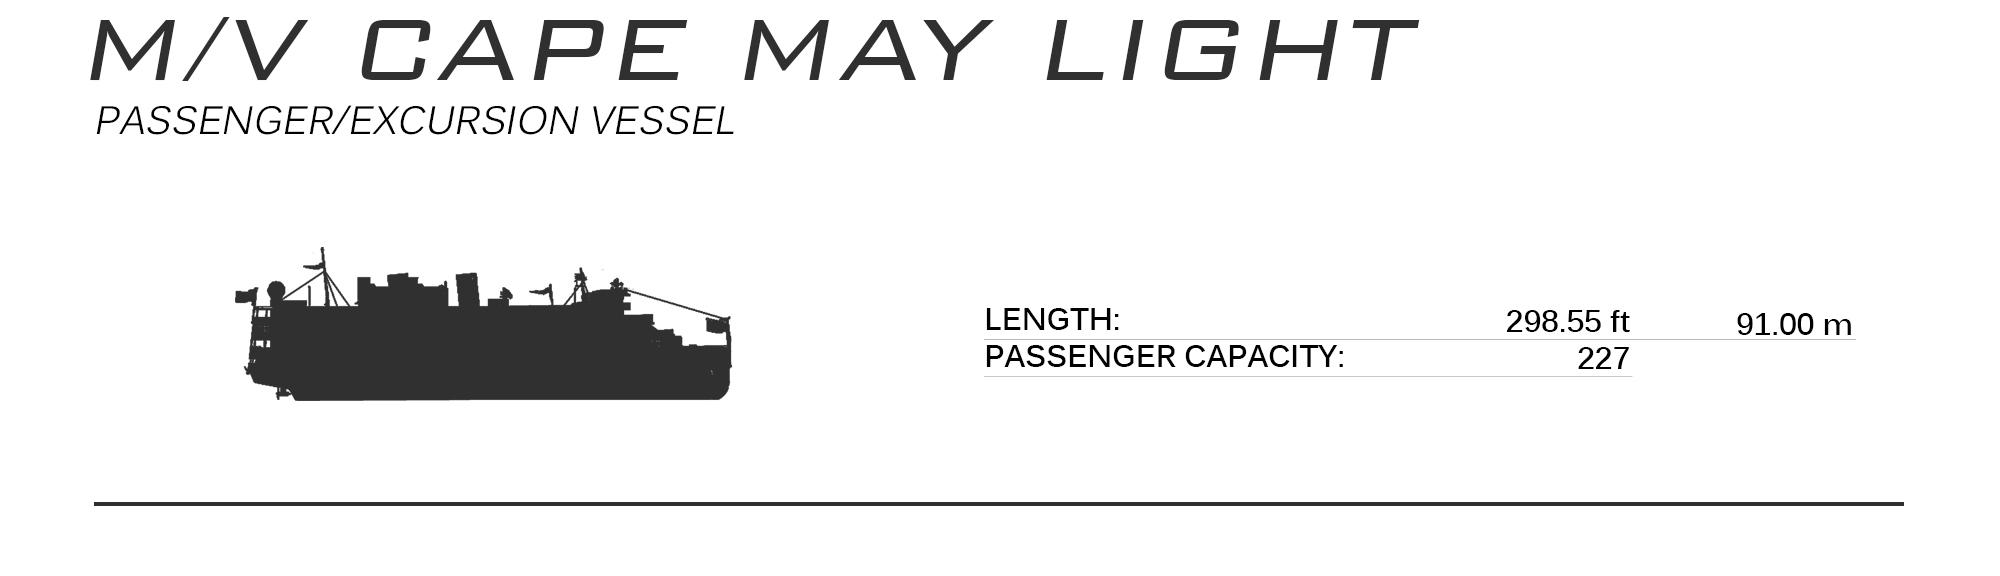 CPAE MAY LIGHT.jpg